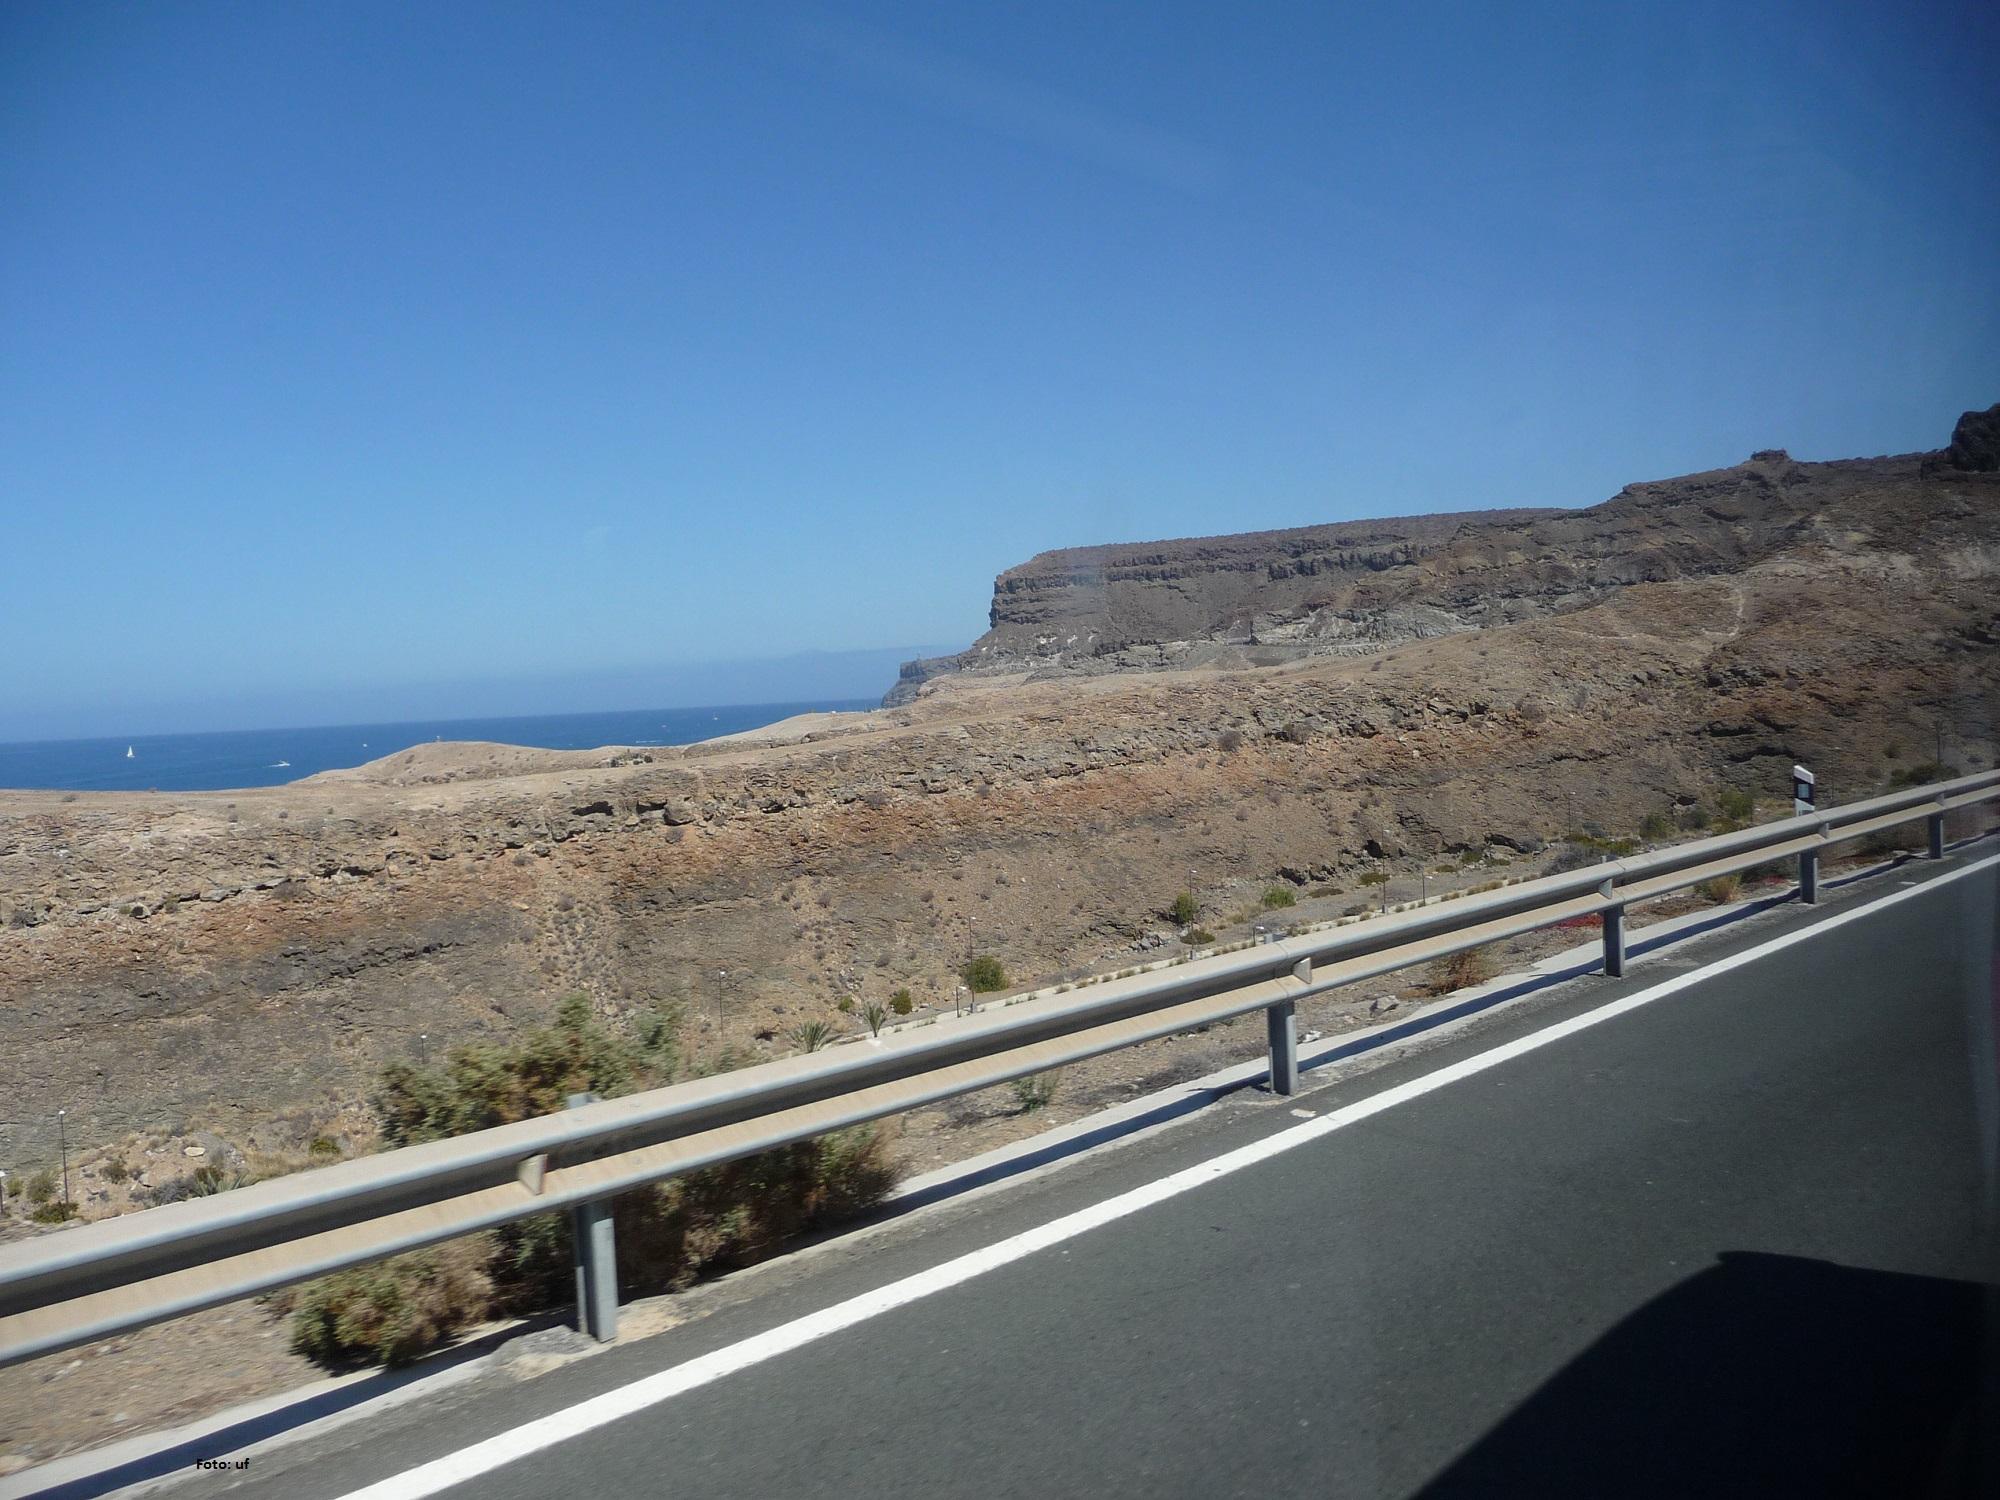 Mit dem Bus nach Puerto de Mogàn